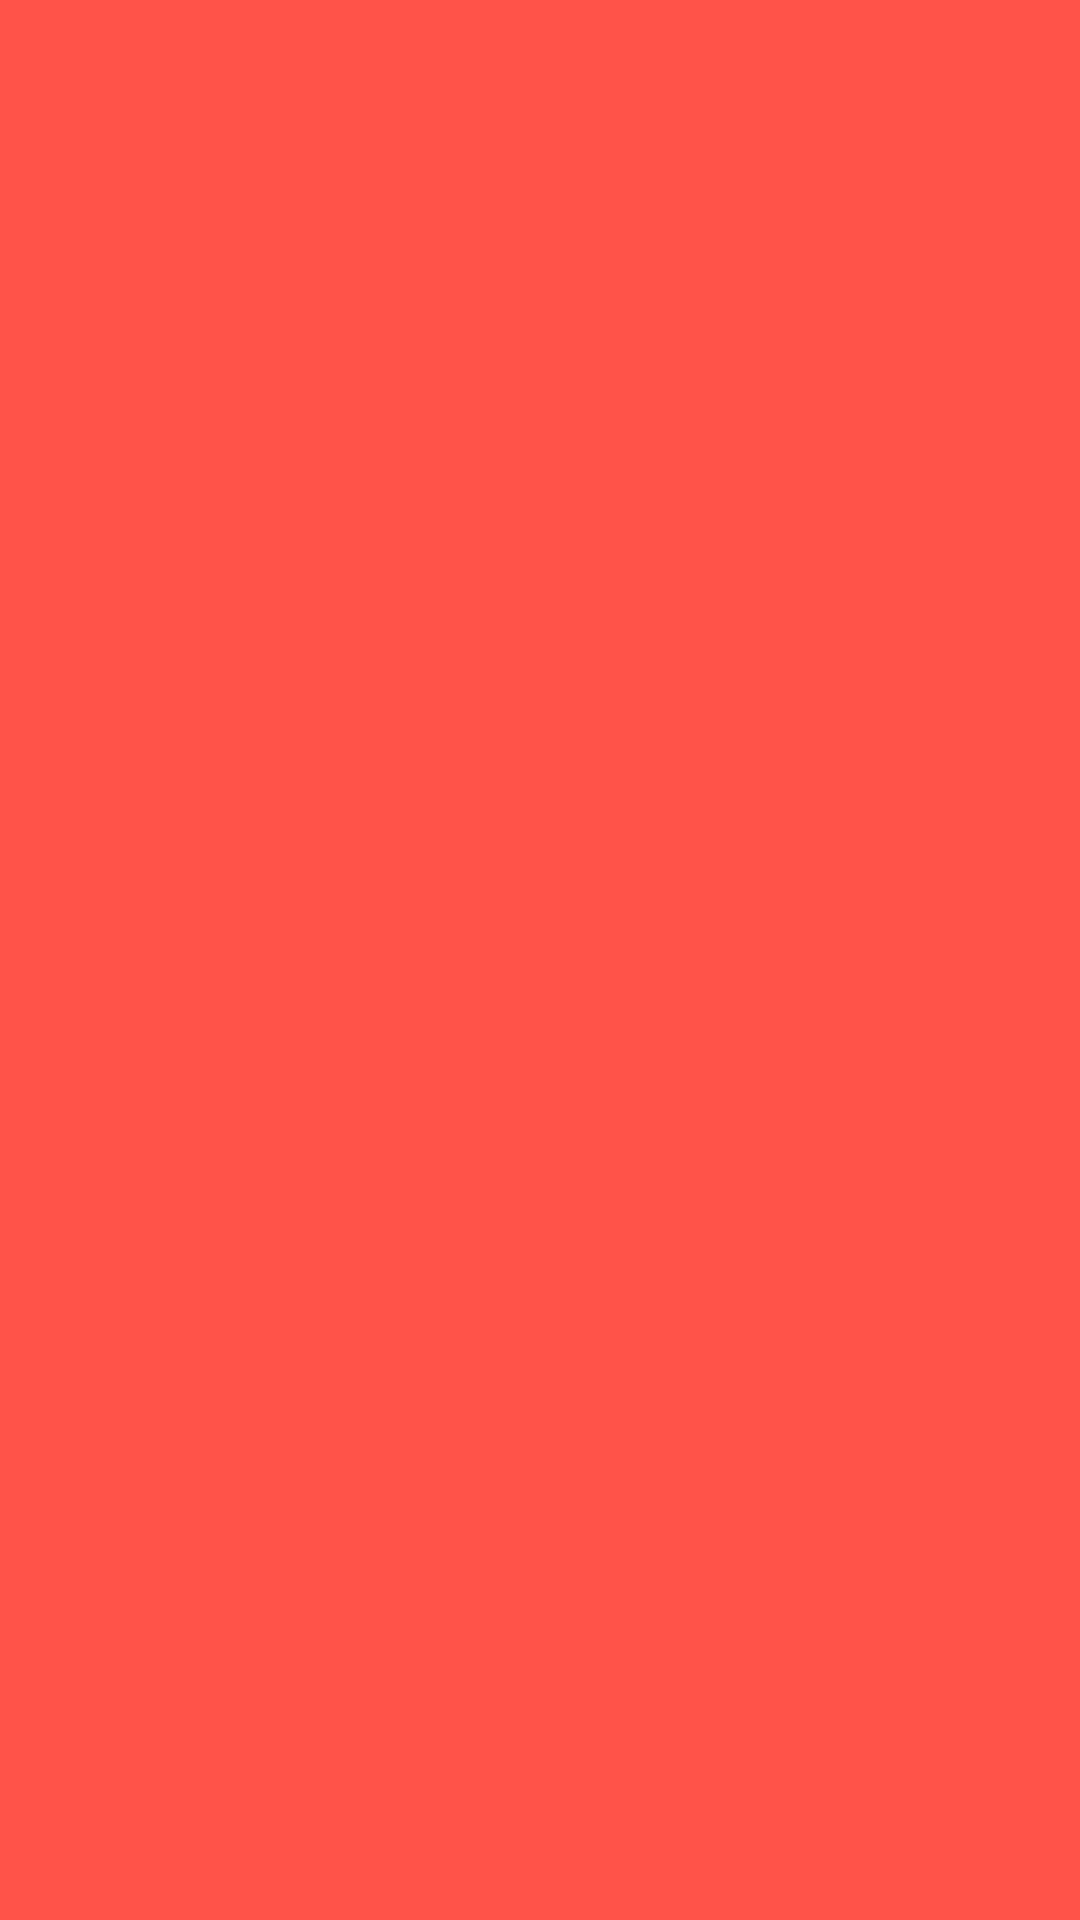 1080x1920 Red-orange Solid Color Background